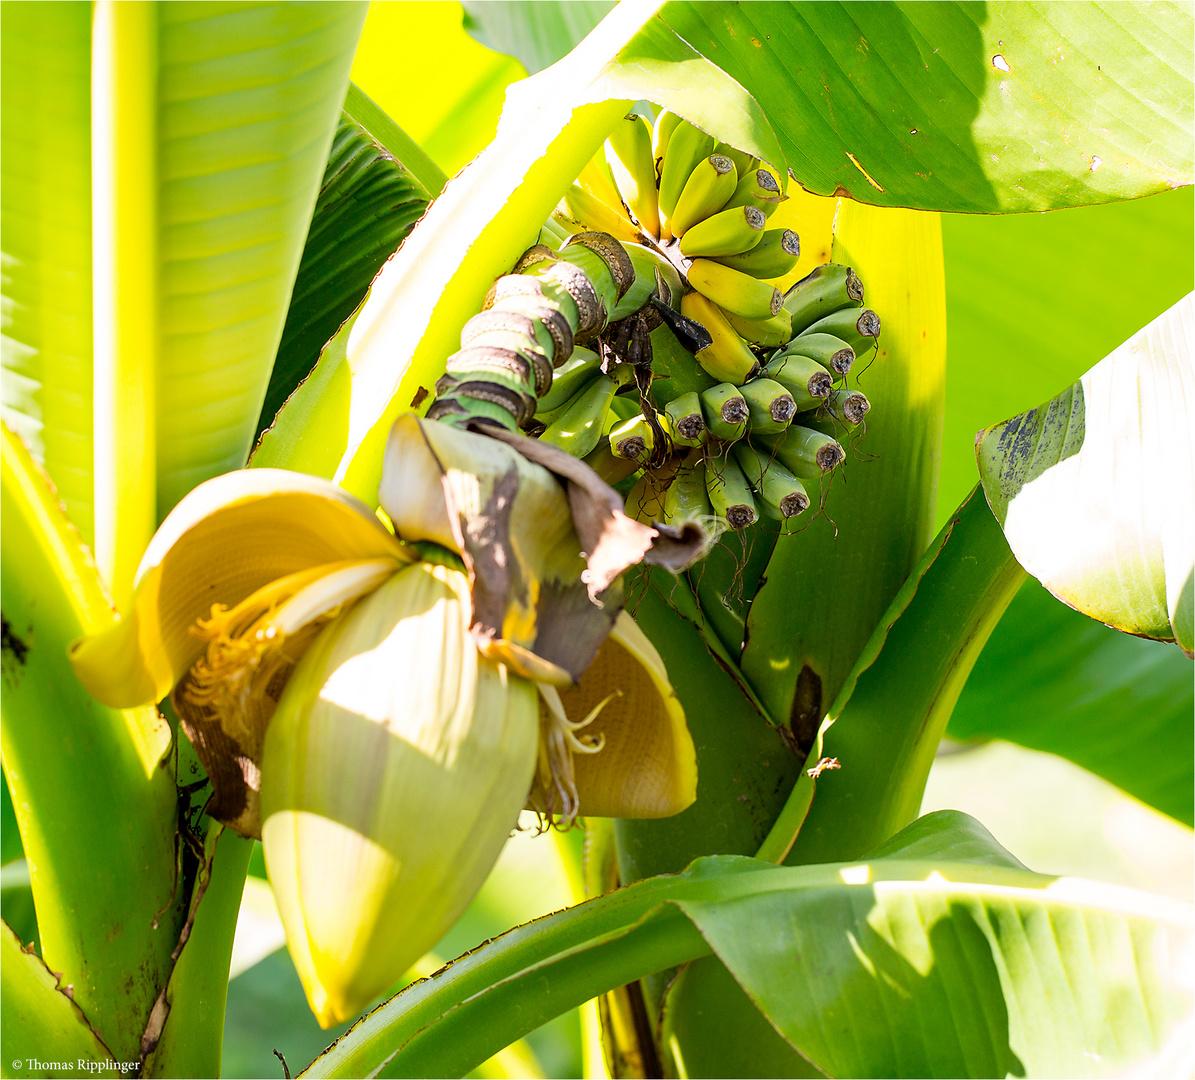 japanische faser banane musa basjoo foto bild pflanzen pilze flechten b ume obstb ume. Black Bedroom Furniture Sets. Home Design Ideas